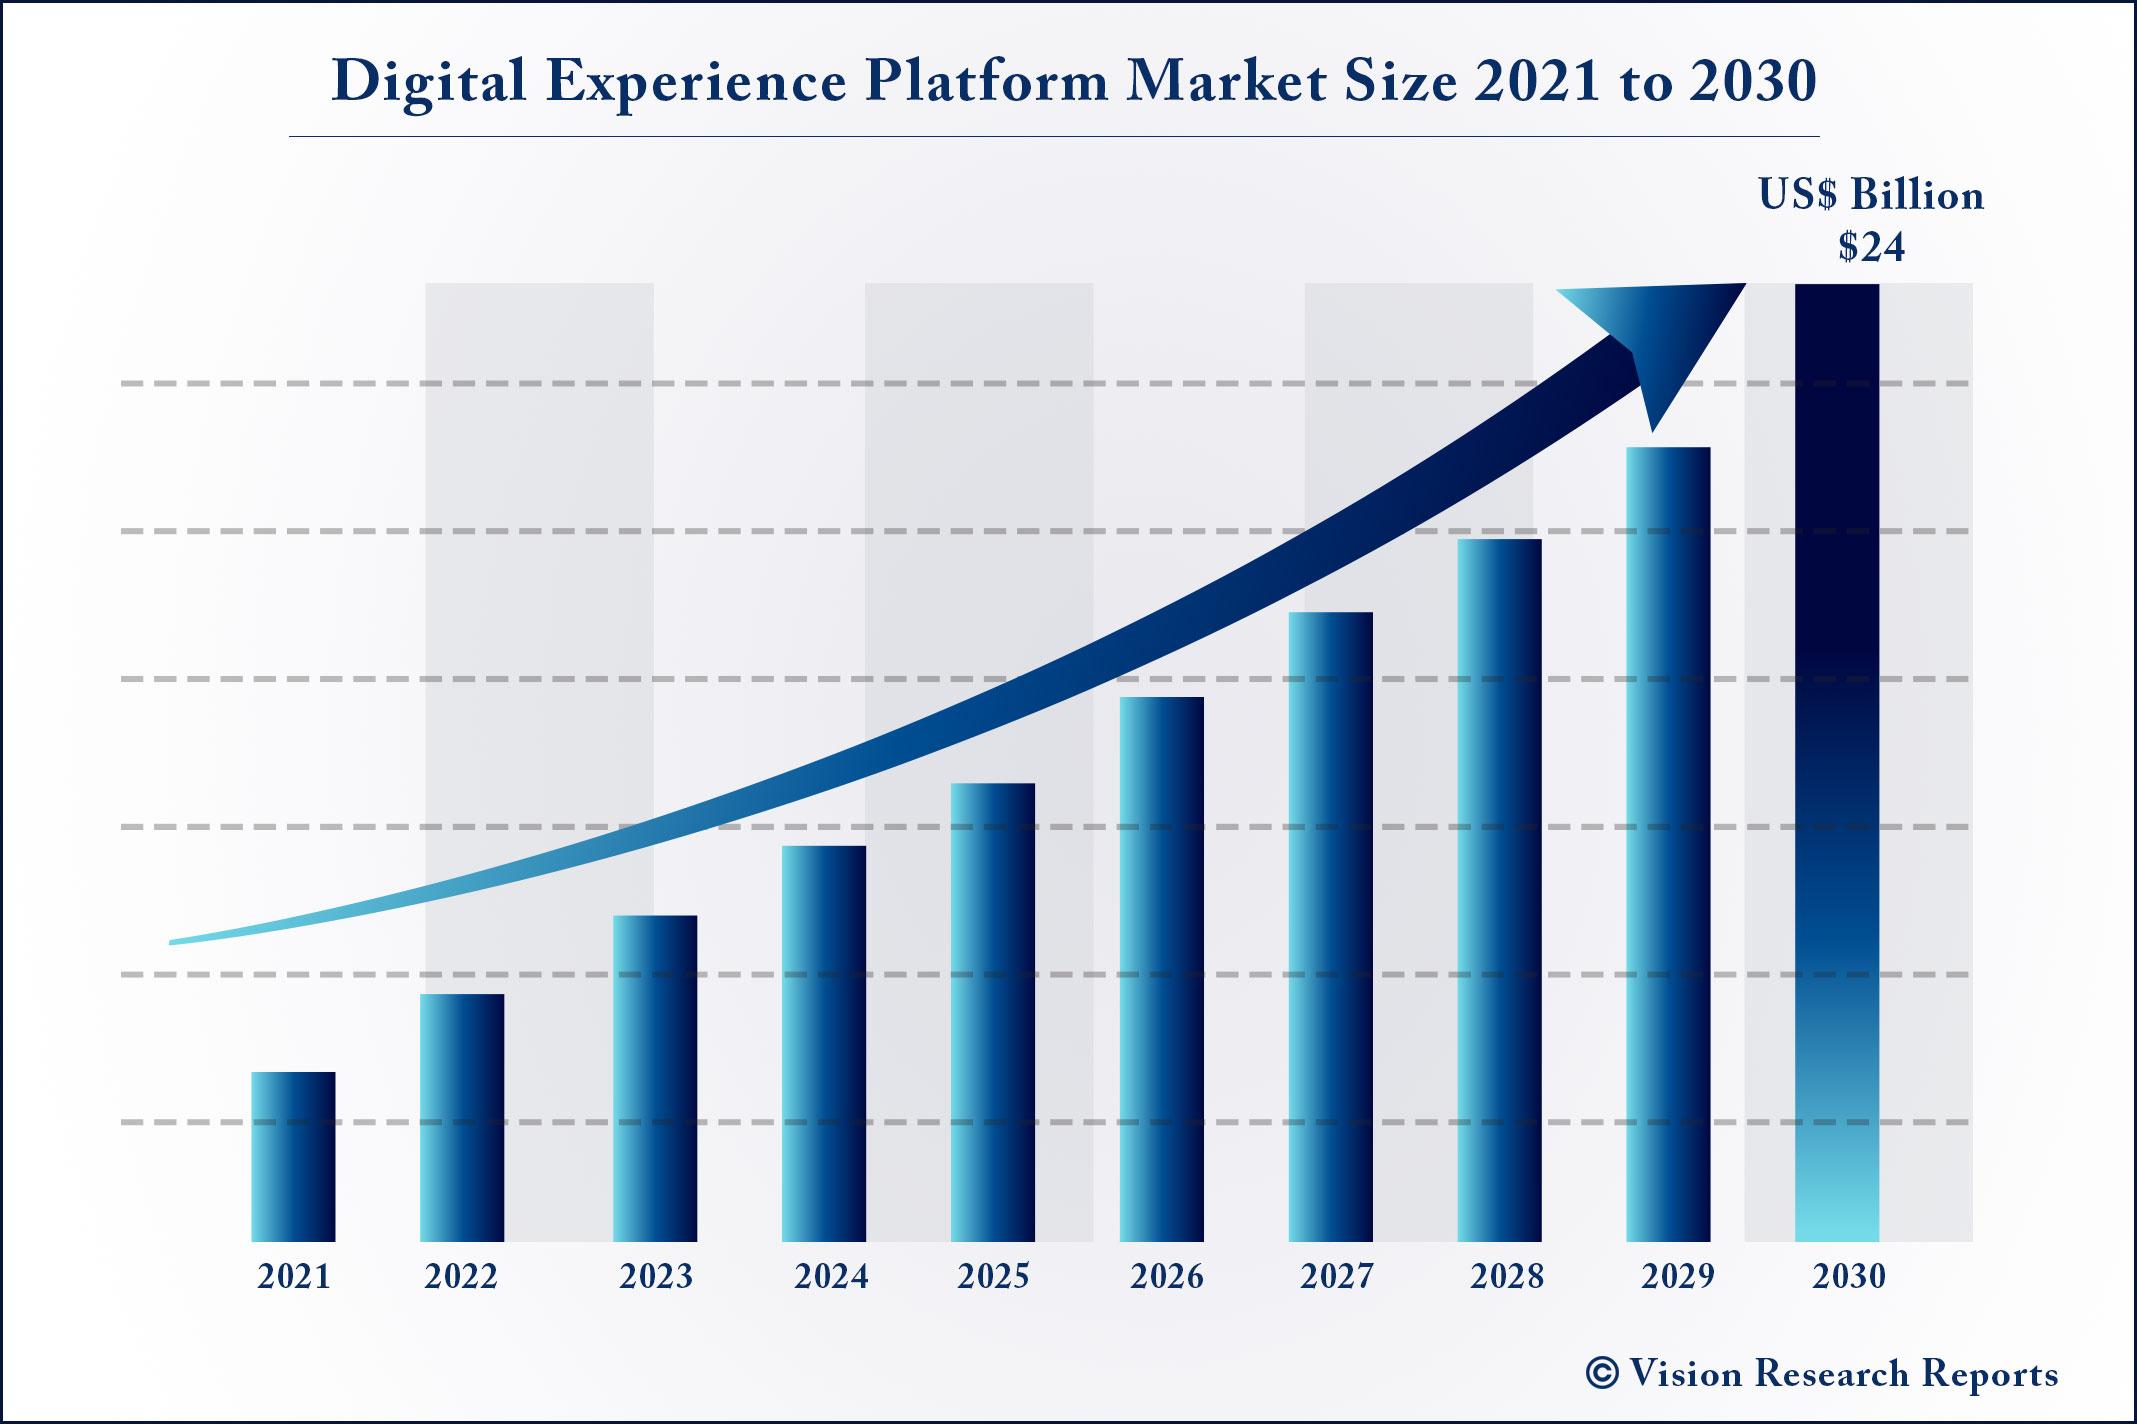 Digital Experience Platform Market Size 2021 to 2030